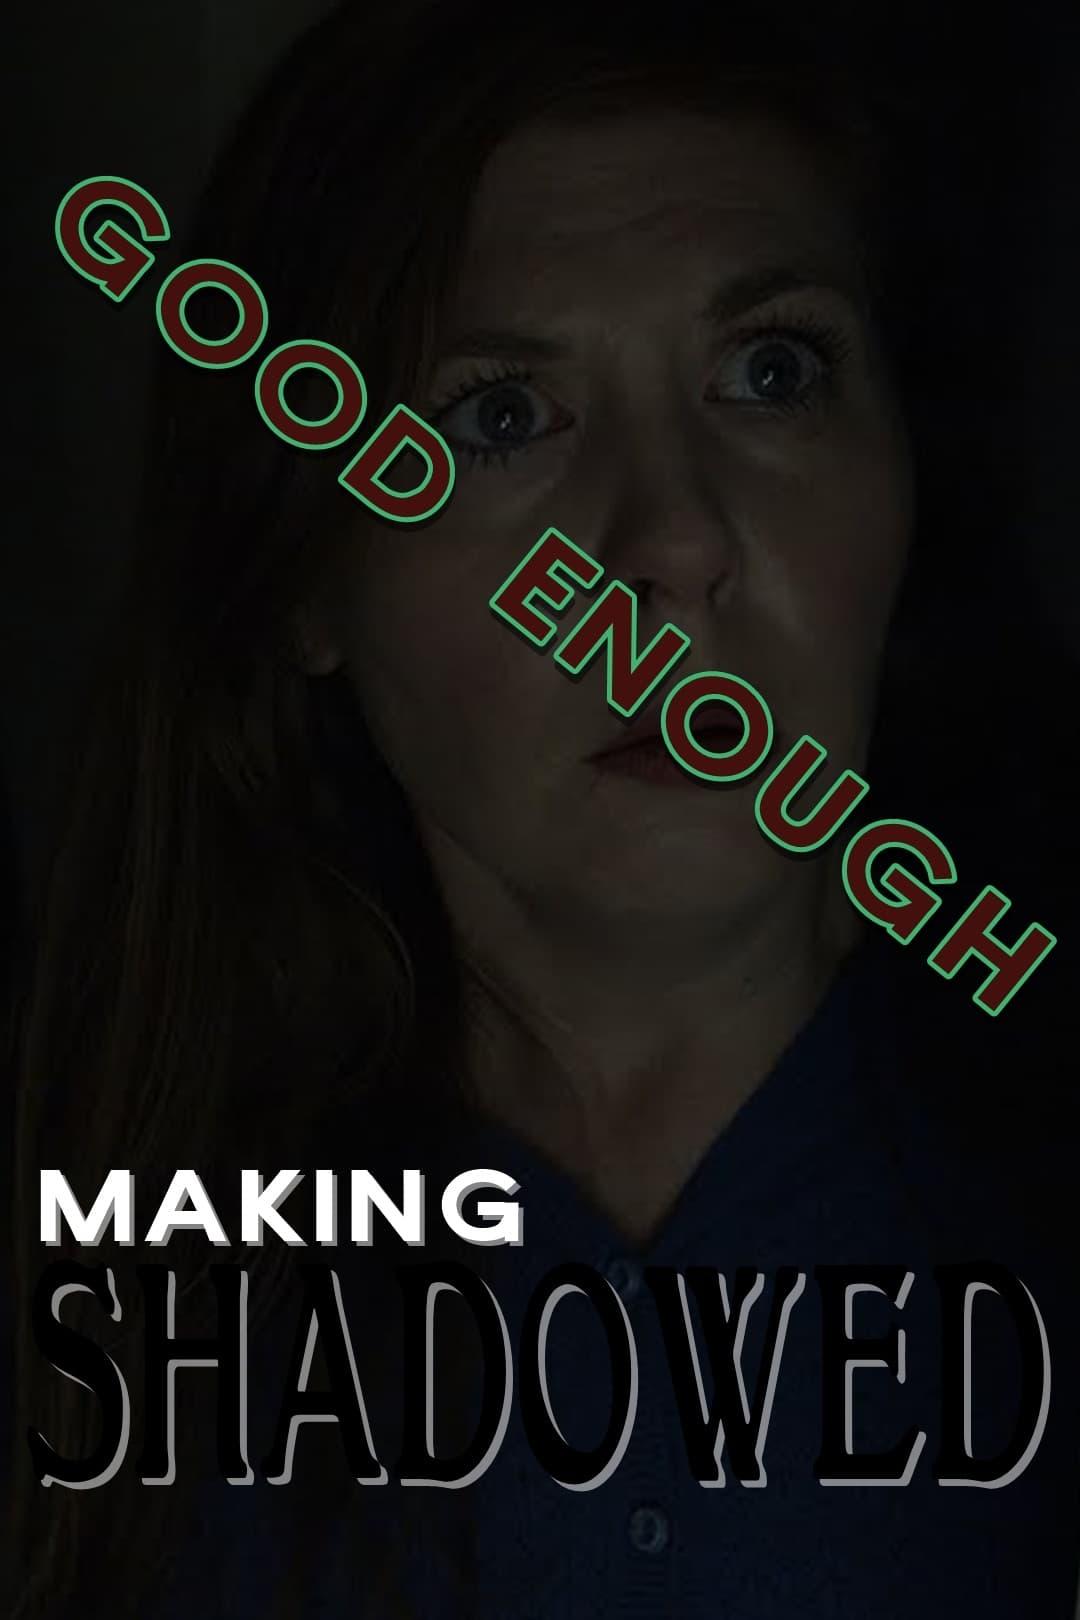 Good Enough: Making Shadowed